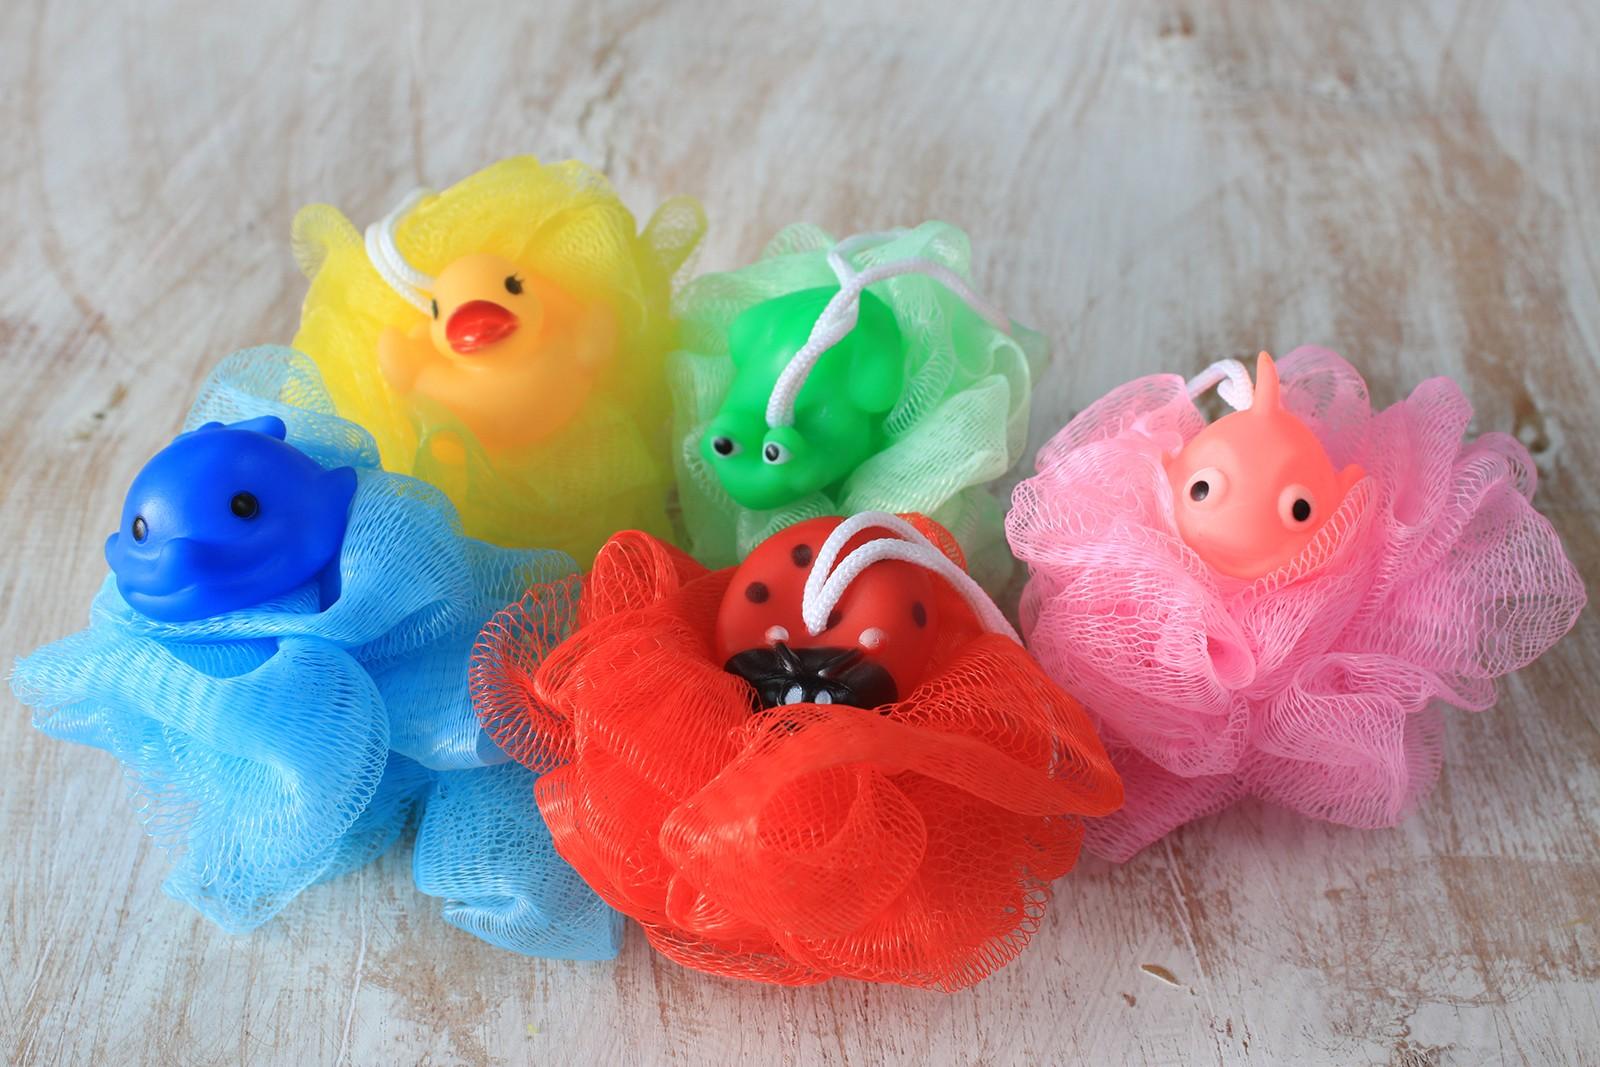 Squeaky Toy Scrunchie30gm